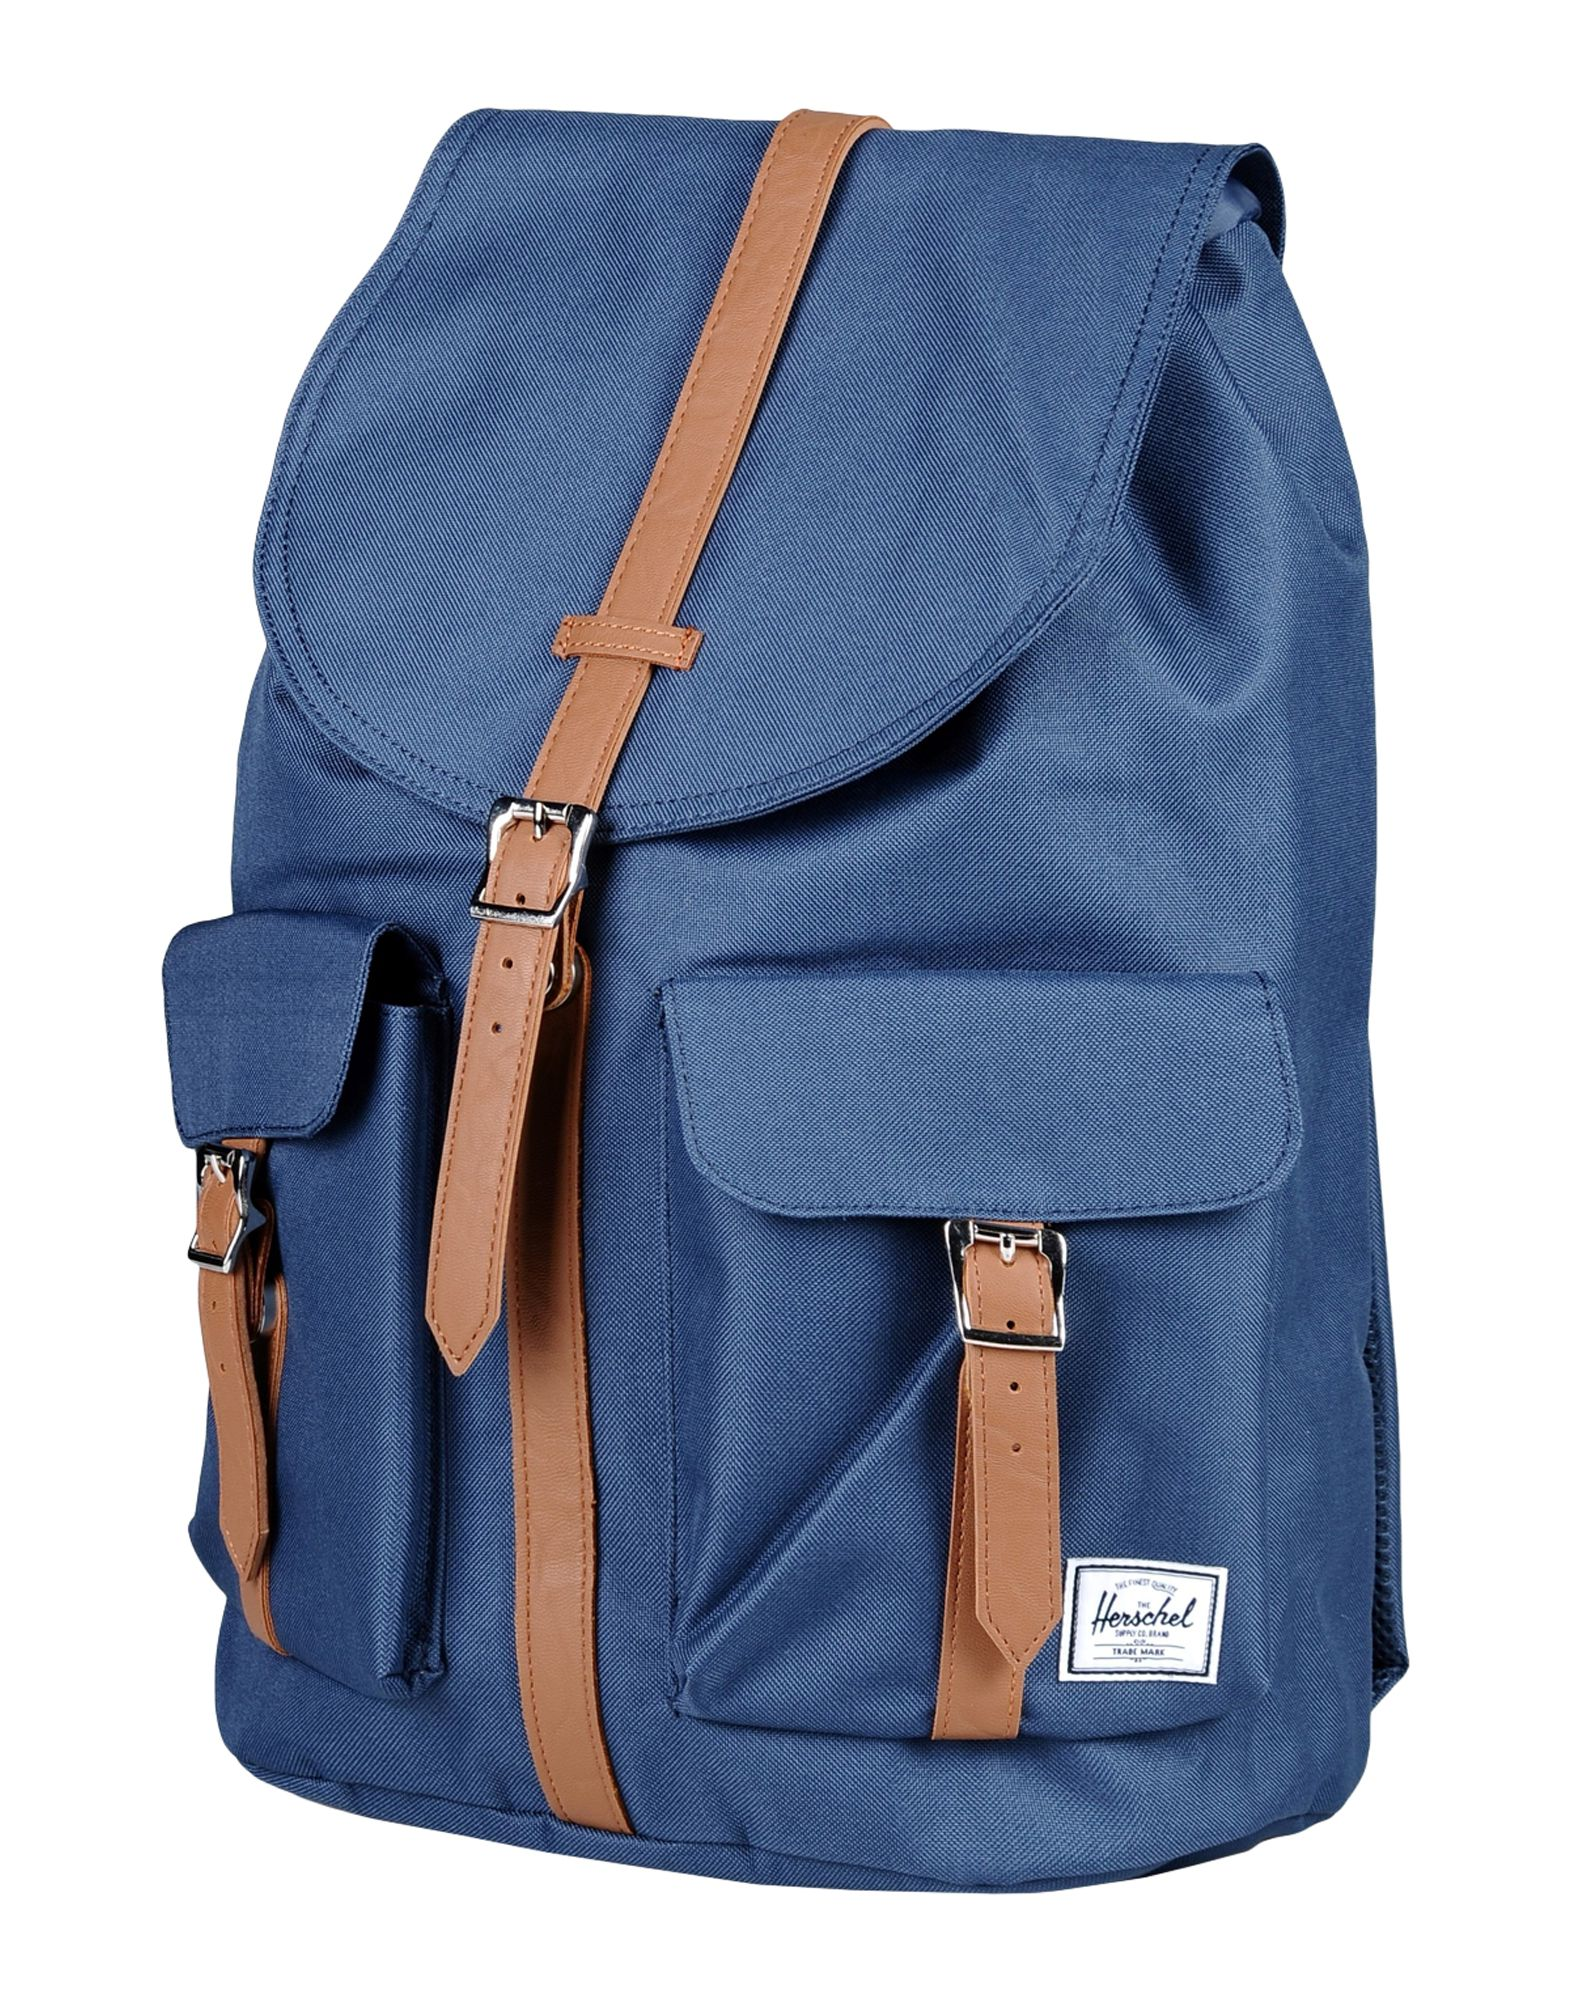 184139f1f36 Herschel Supply Co. Backpack   Fanny Pack